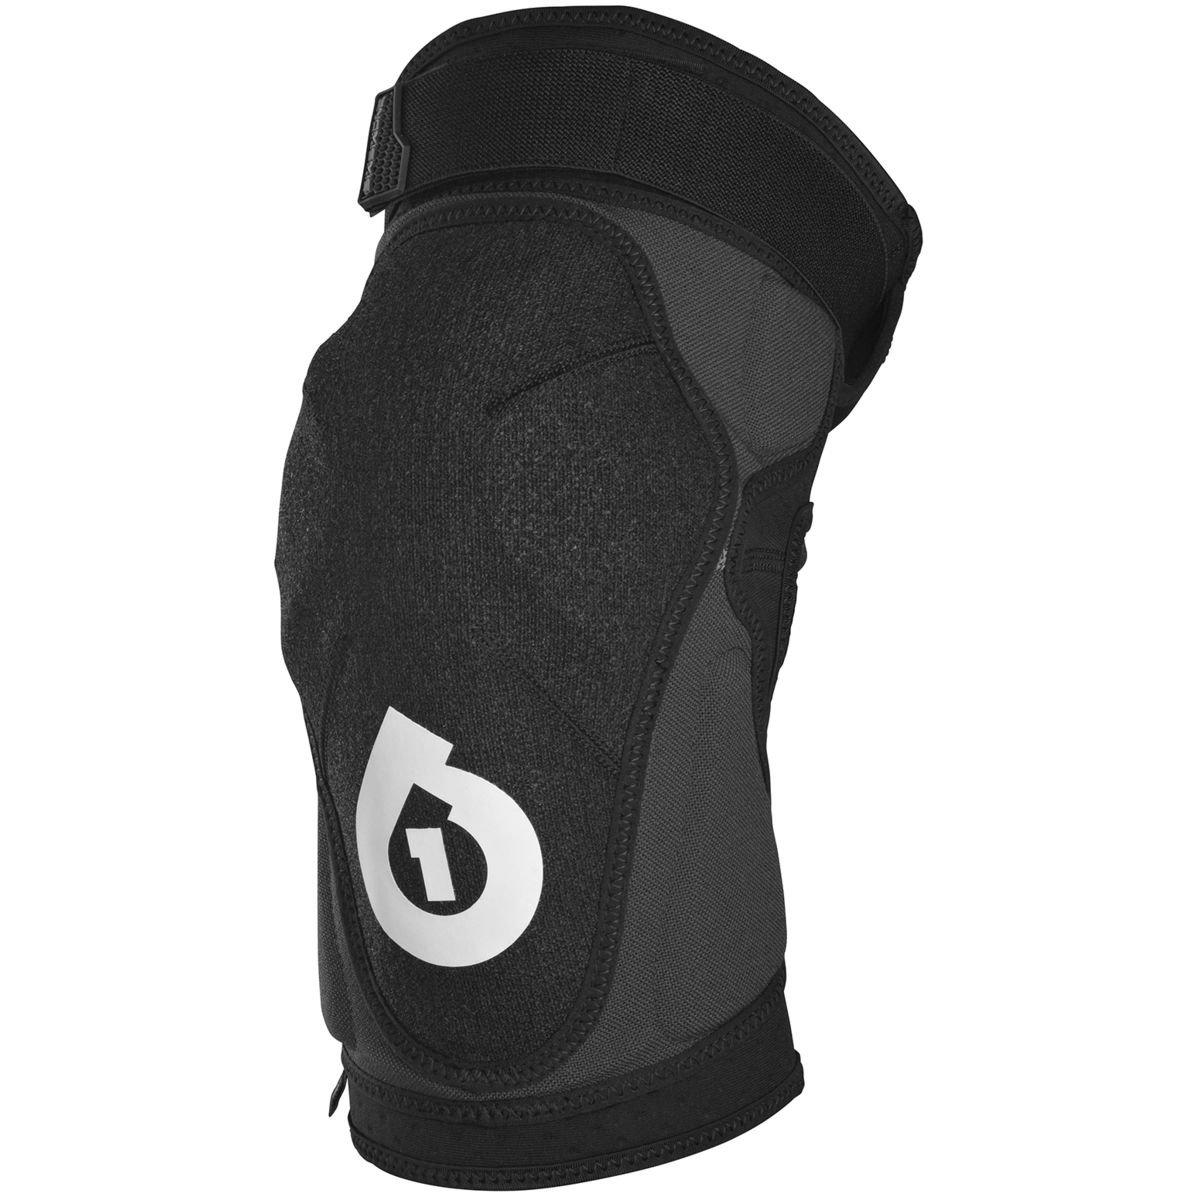 SixSixOne Evo Knee Guards Black, XL